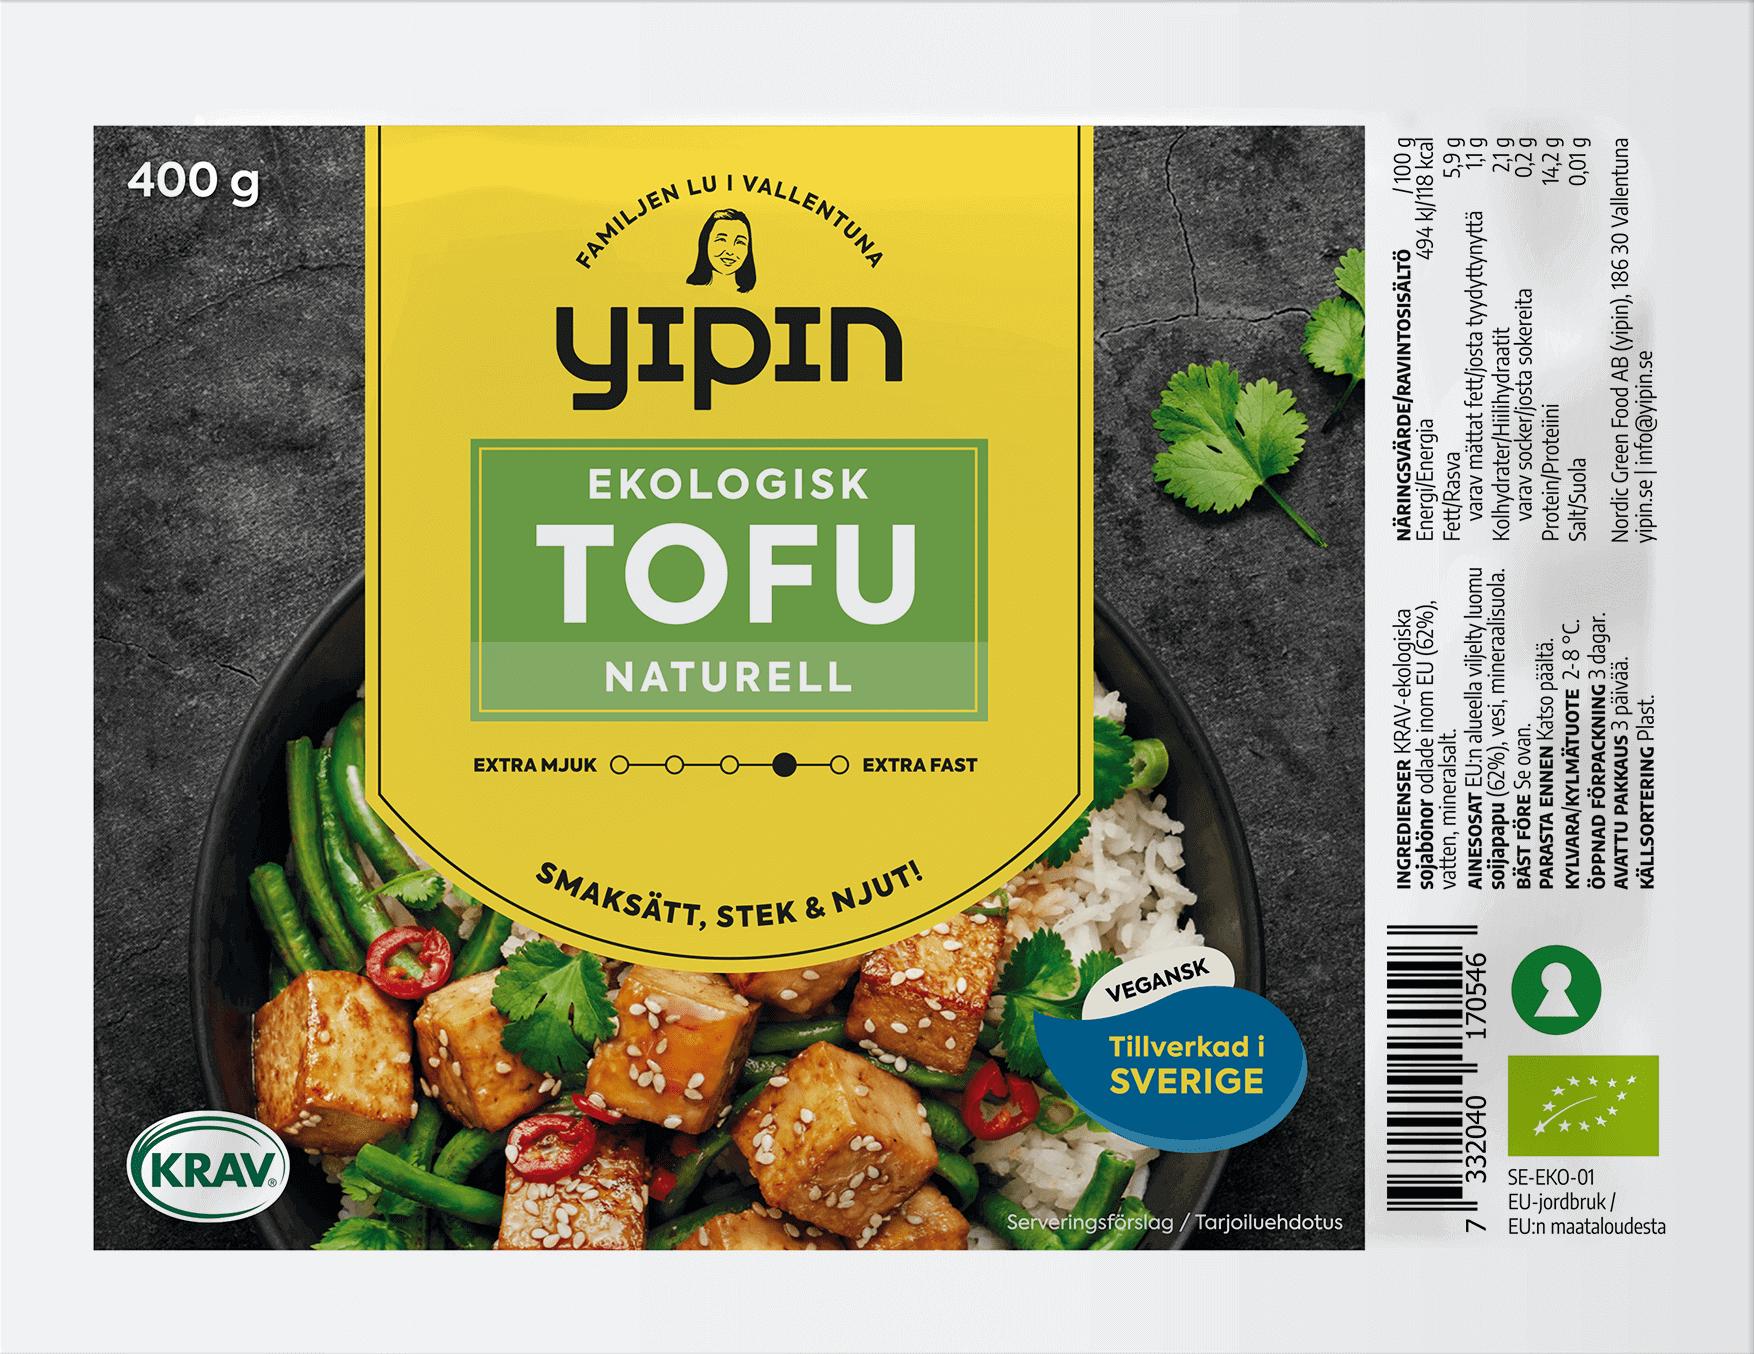 YiPin Tofu Naturell Ekologisk 400g EKO